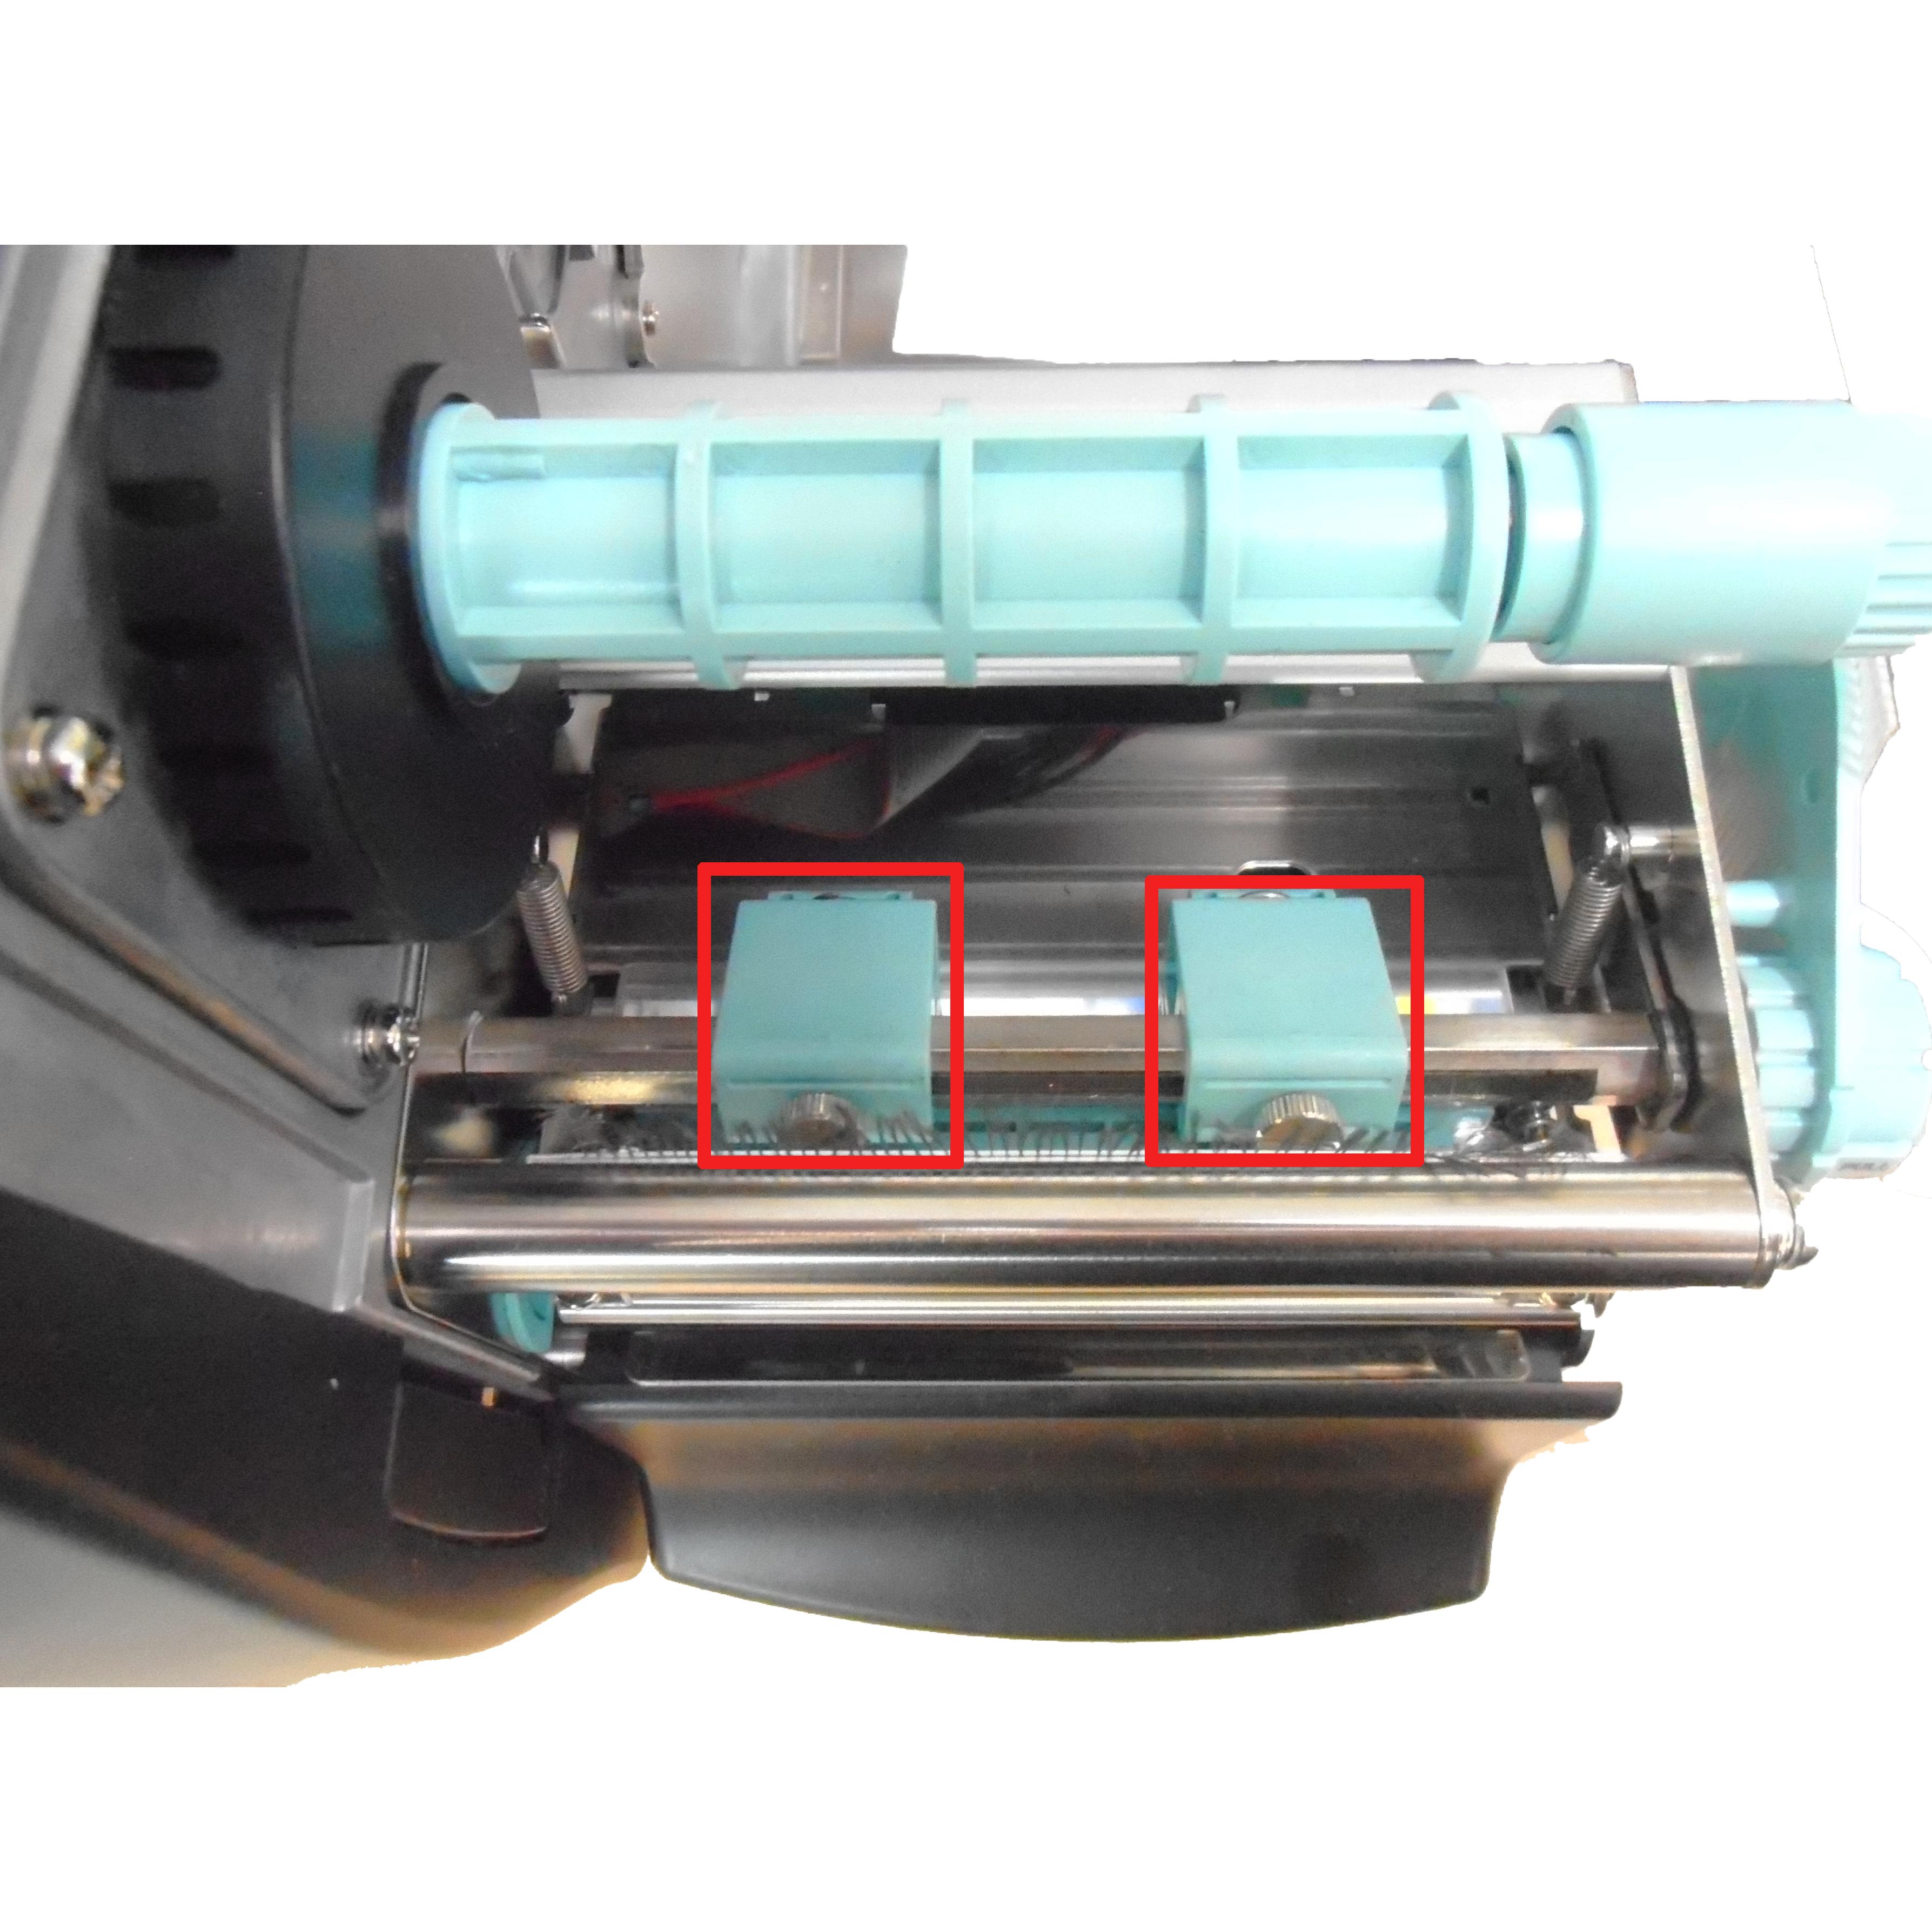 Label printer troubleshooting